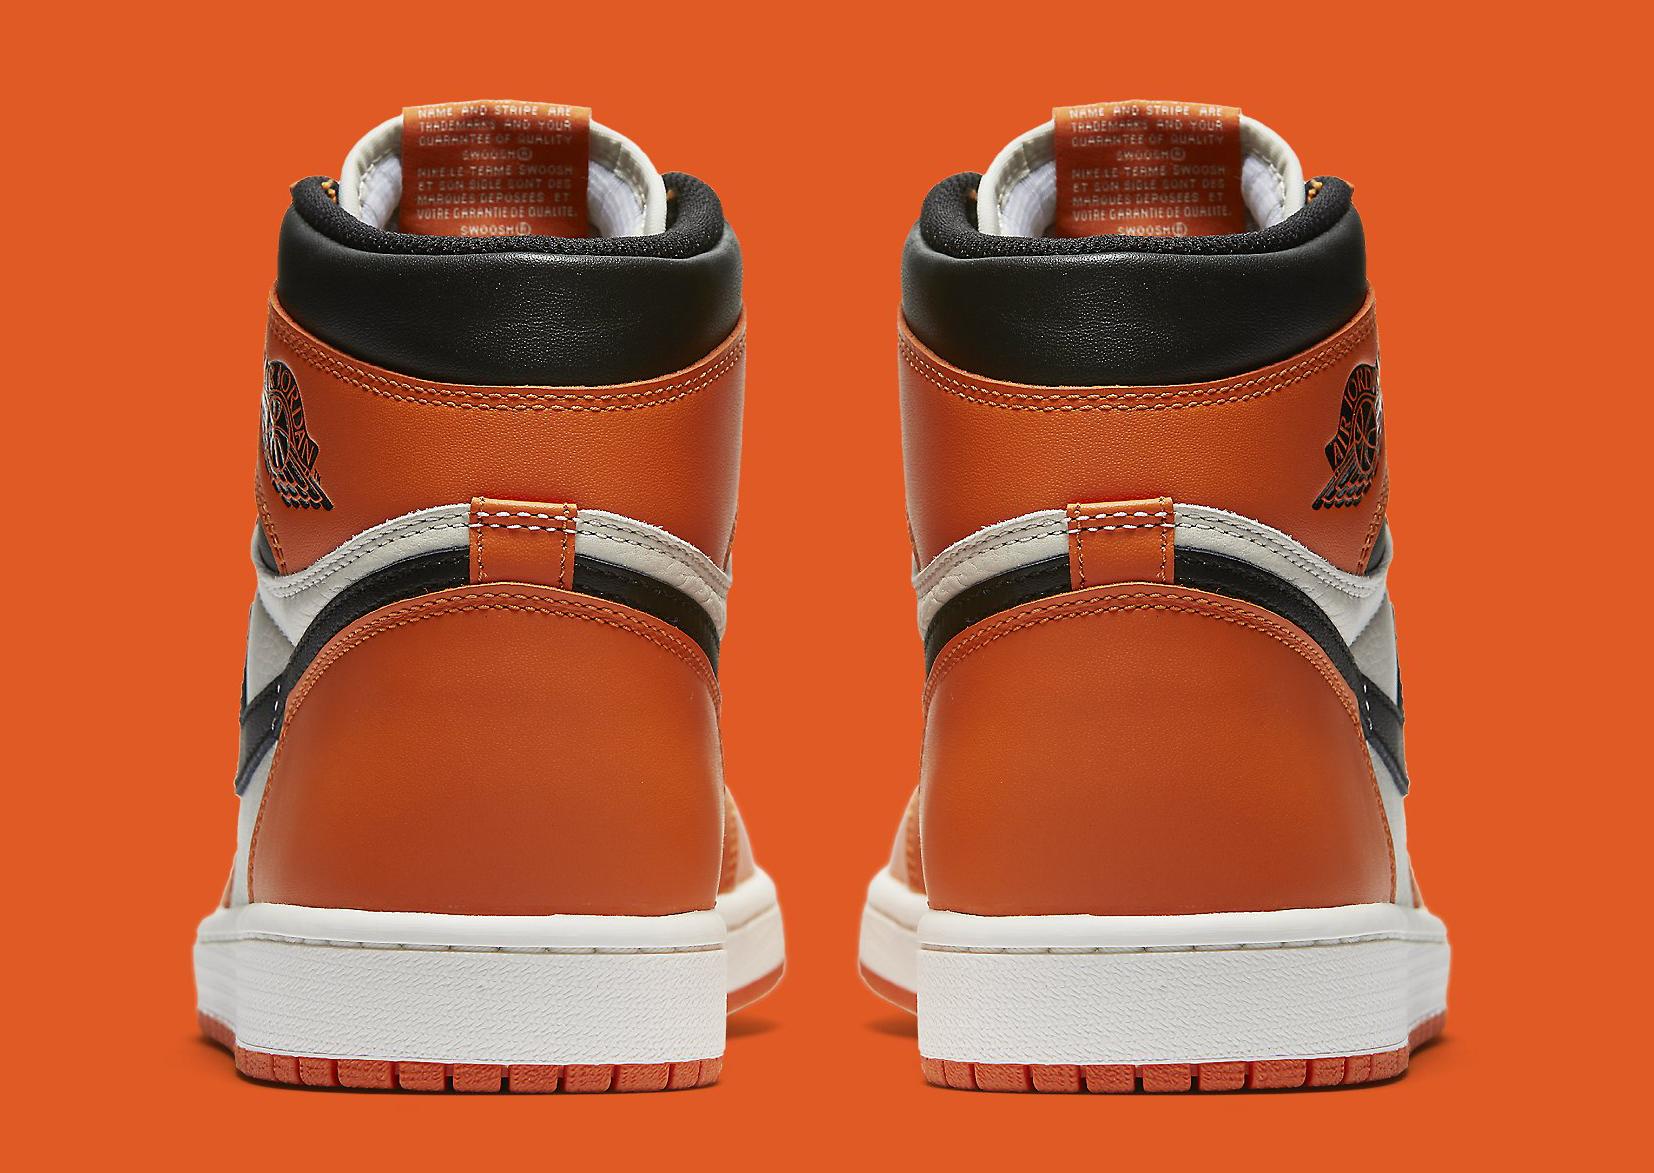 Air Jordan 1 Shattered Backboard Away 555088-113 Heel